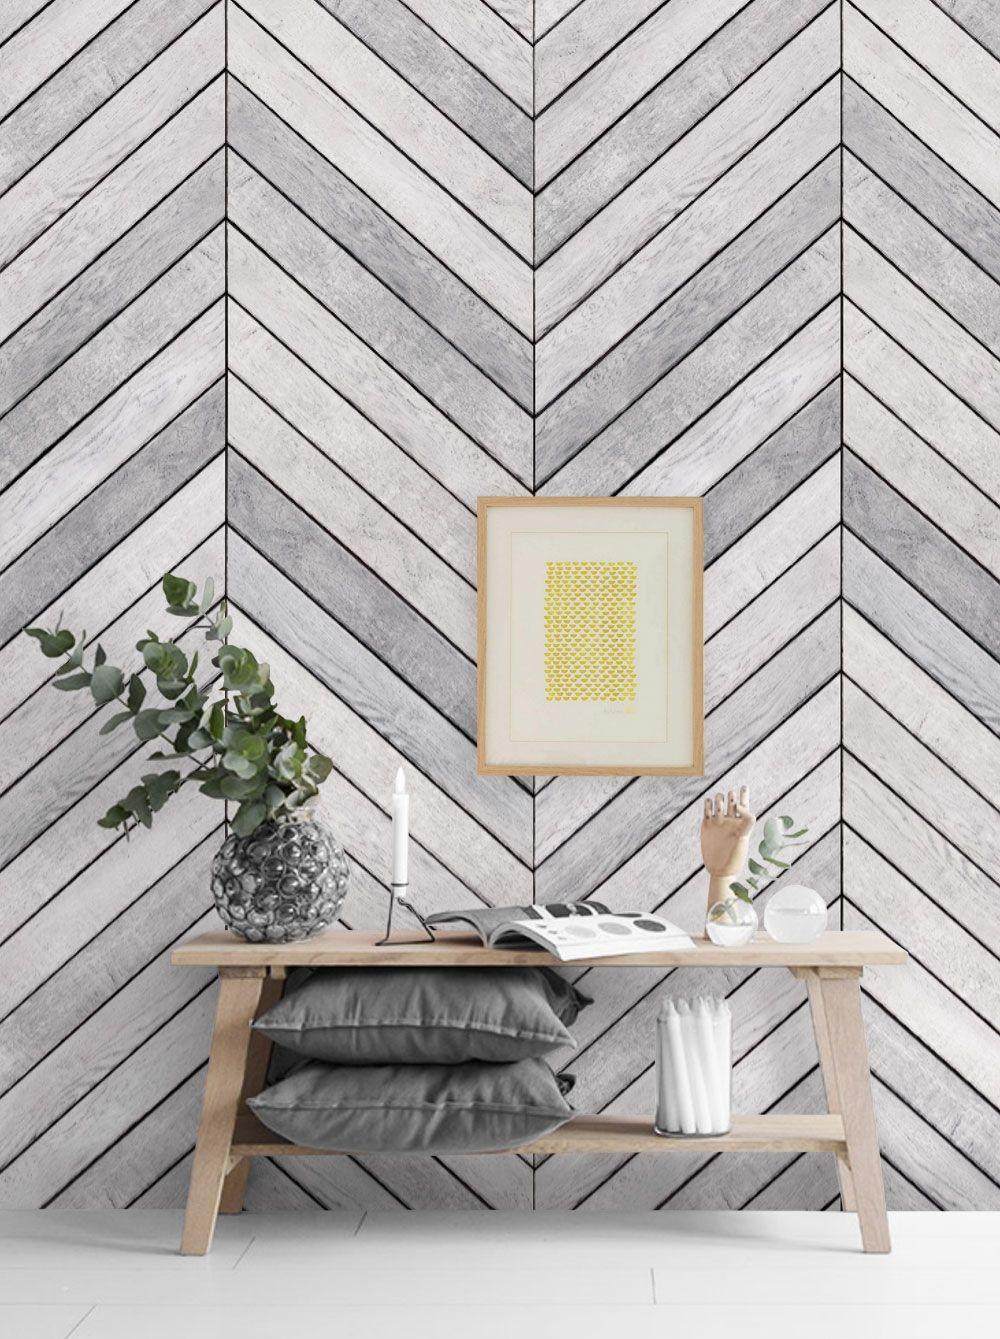 Chevron Grey White Wood Accent Mural Wall Art Wallpaper Peel And Stick Accent Wallpaper Wood Accent Wall Wall Art Wallpaper